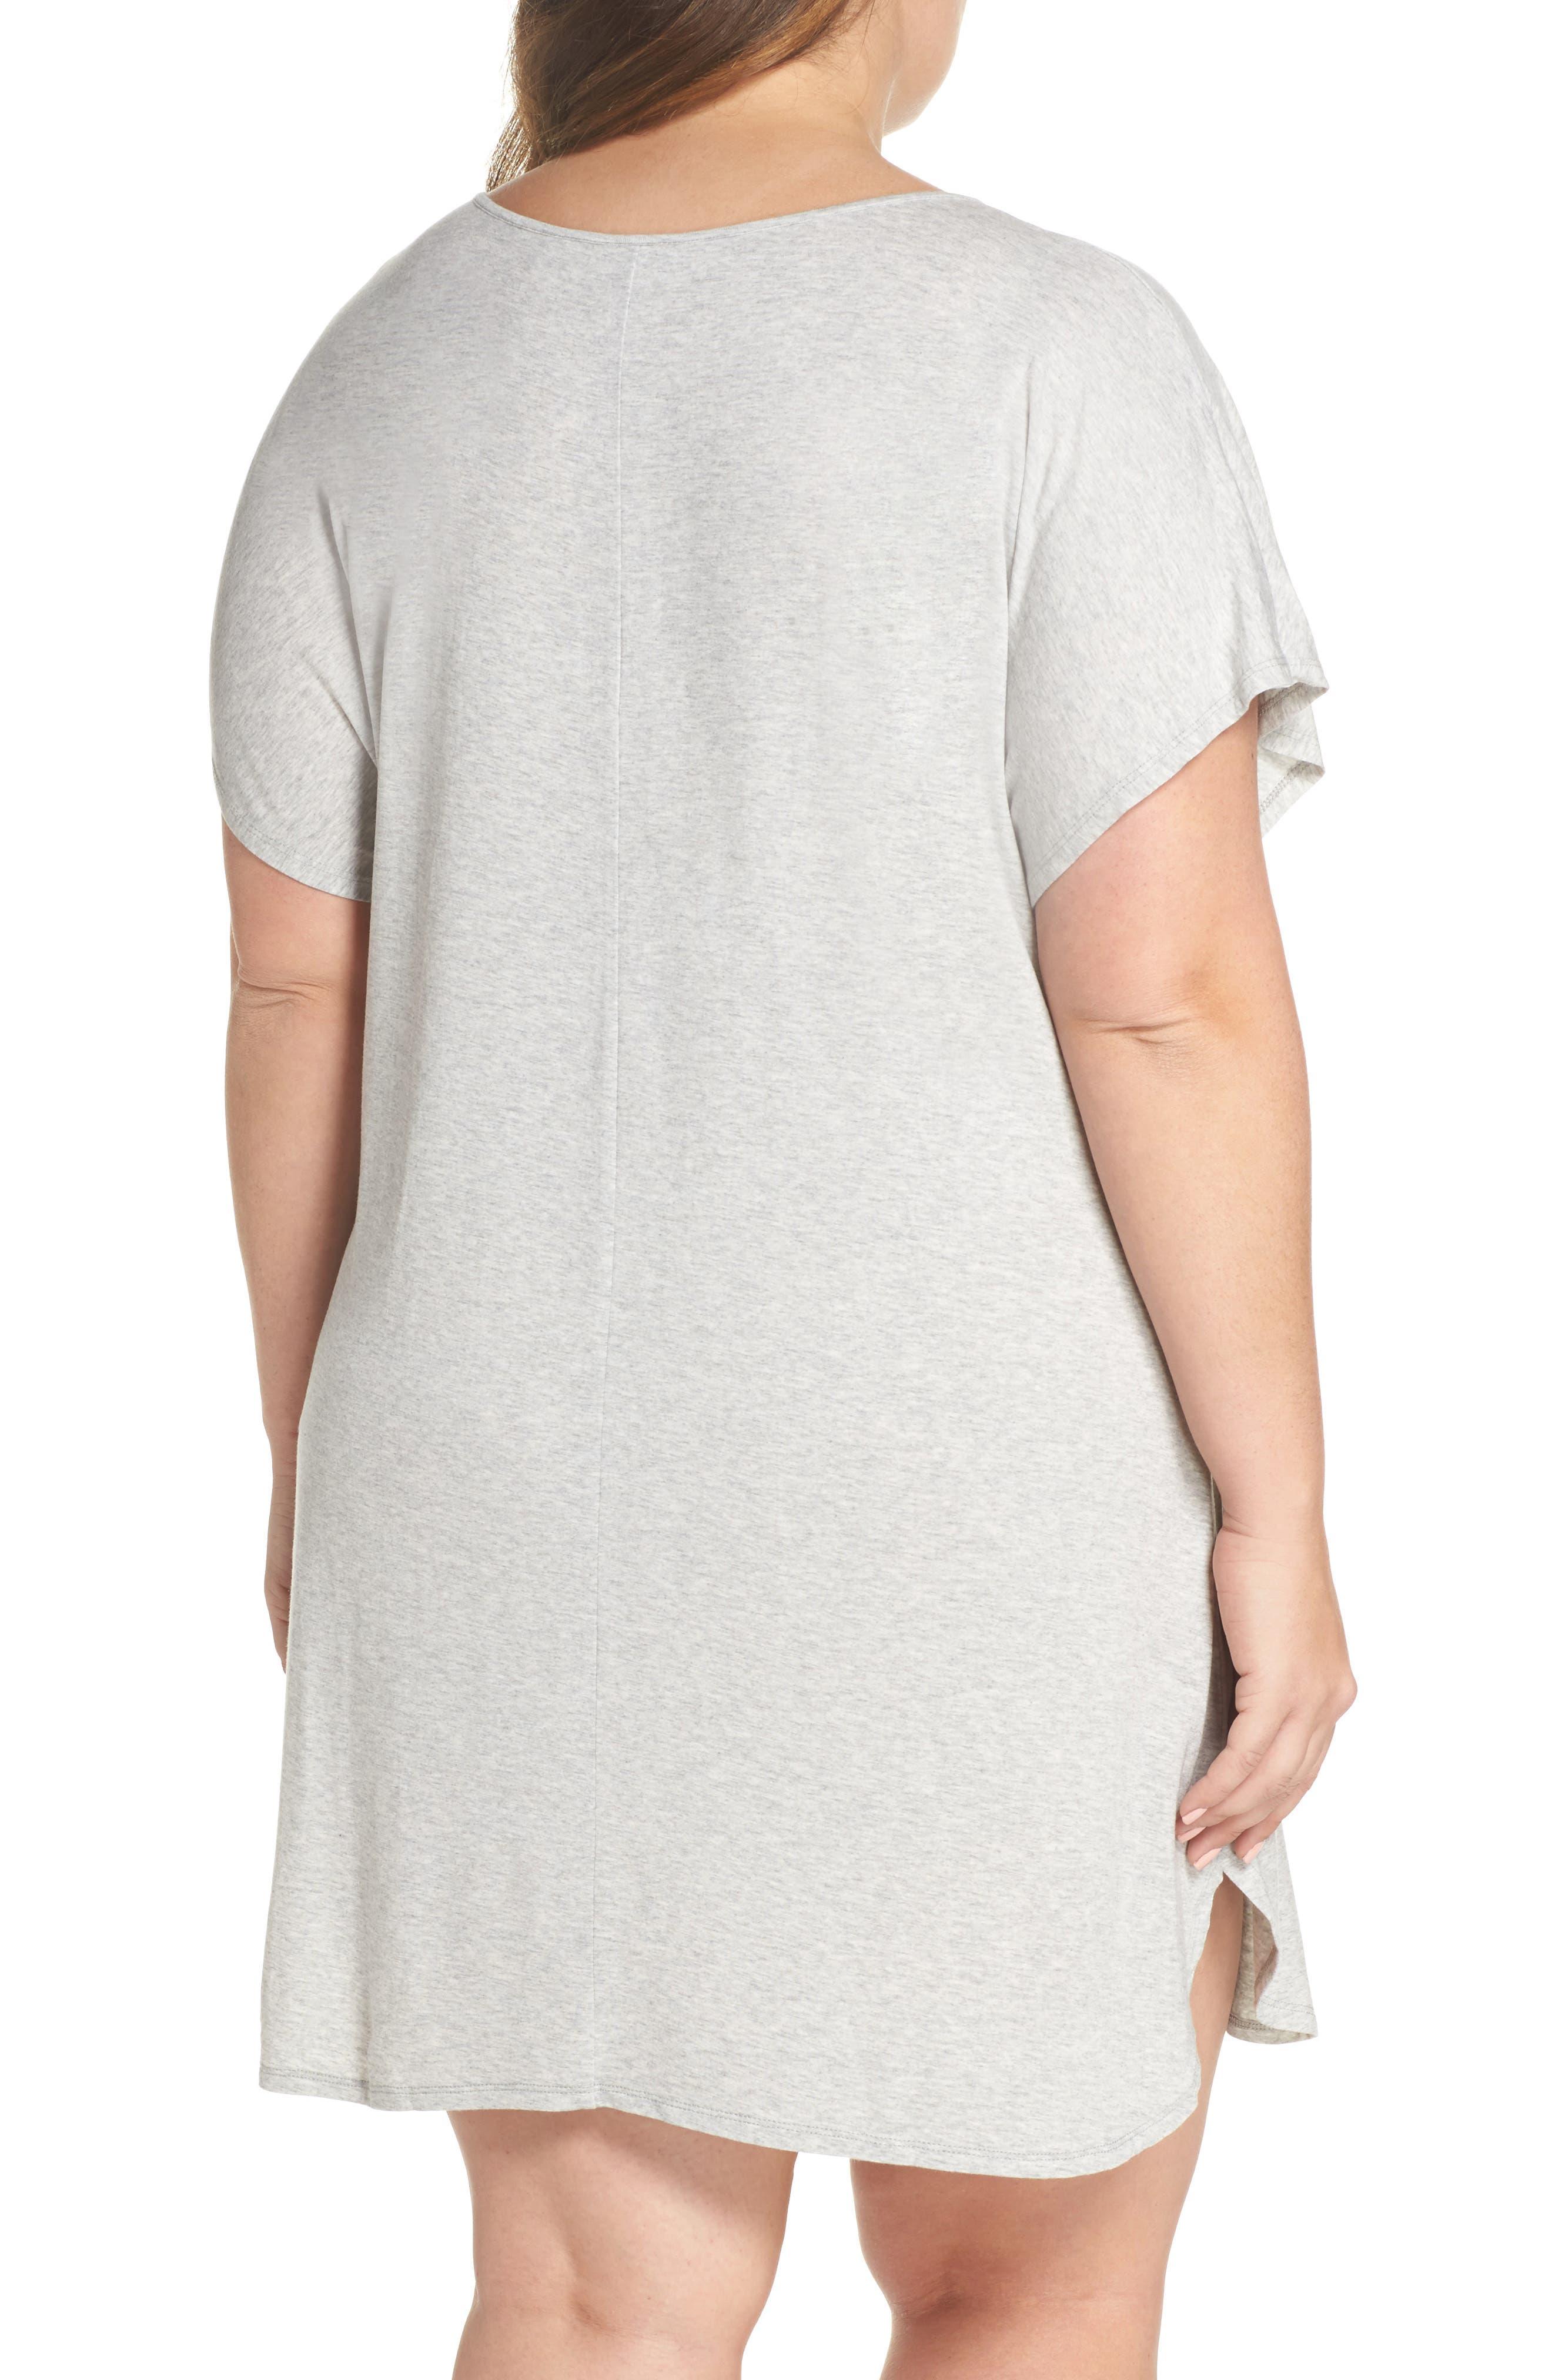 Dolman Sleeve Nightshirt,                             Alternate thumbnail 2, color,                             Grey Pearl Heather